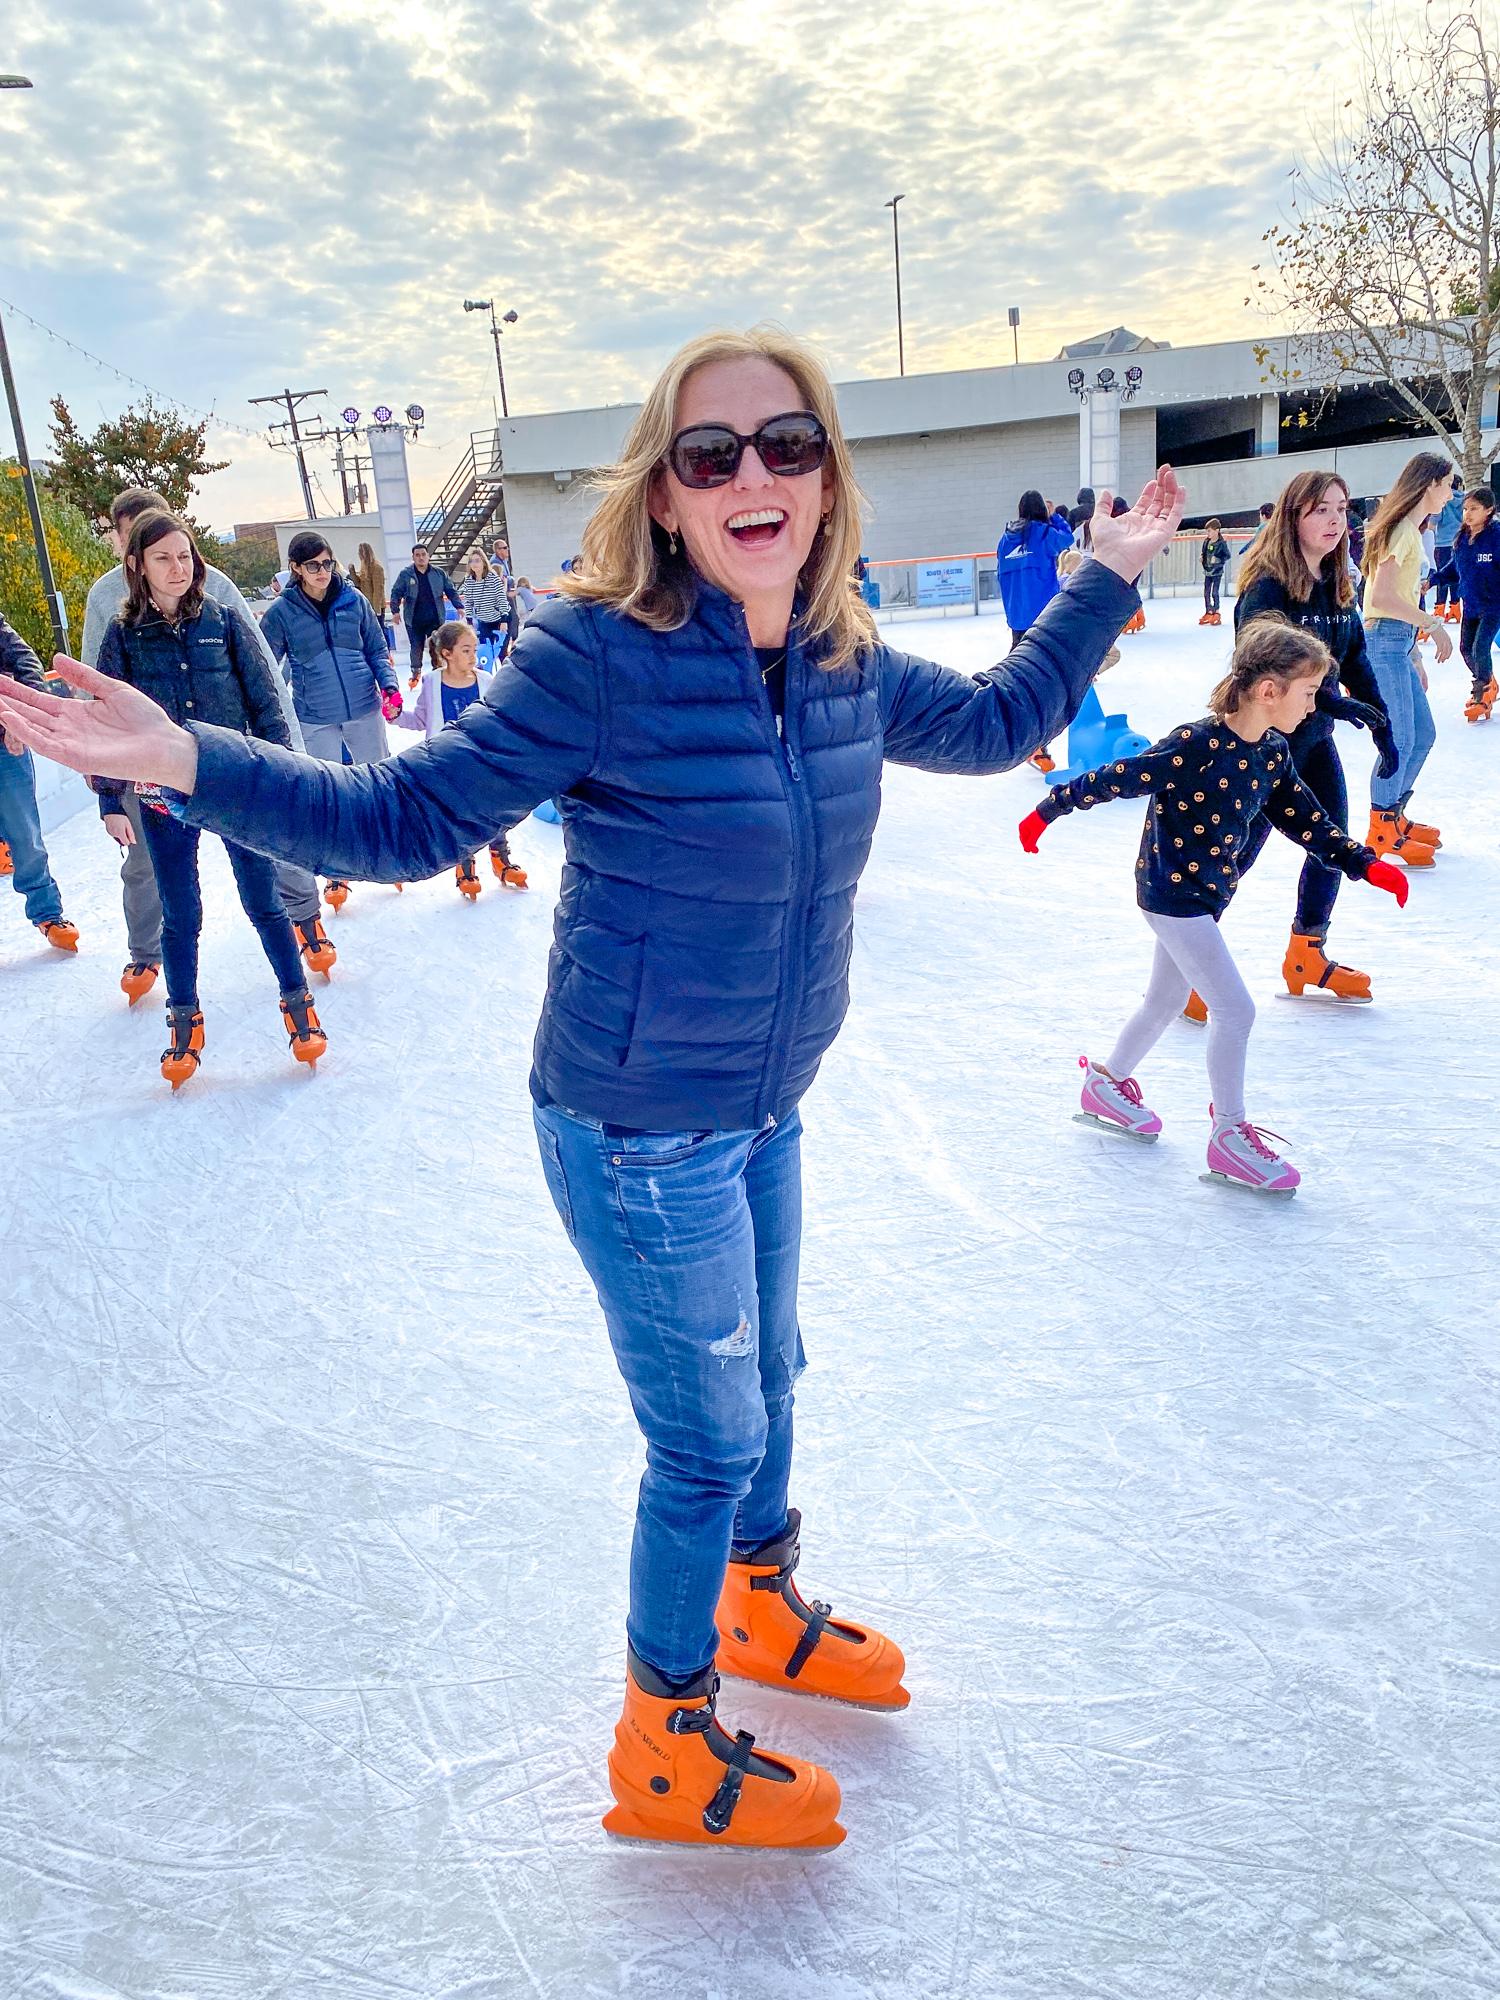 Ice skating at The Rink Downtown Burbank